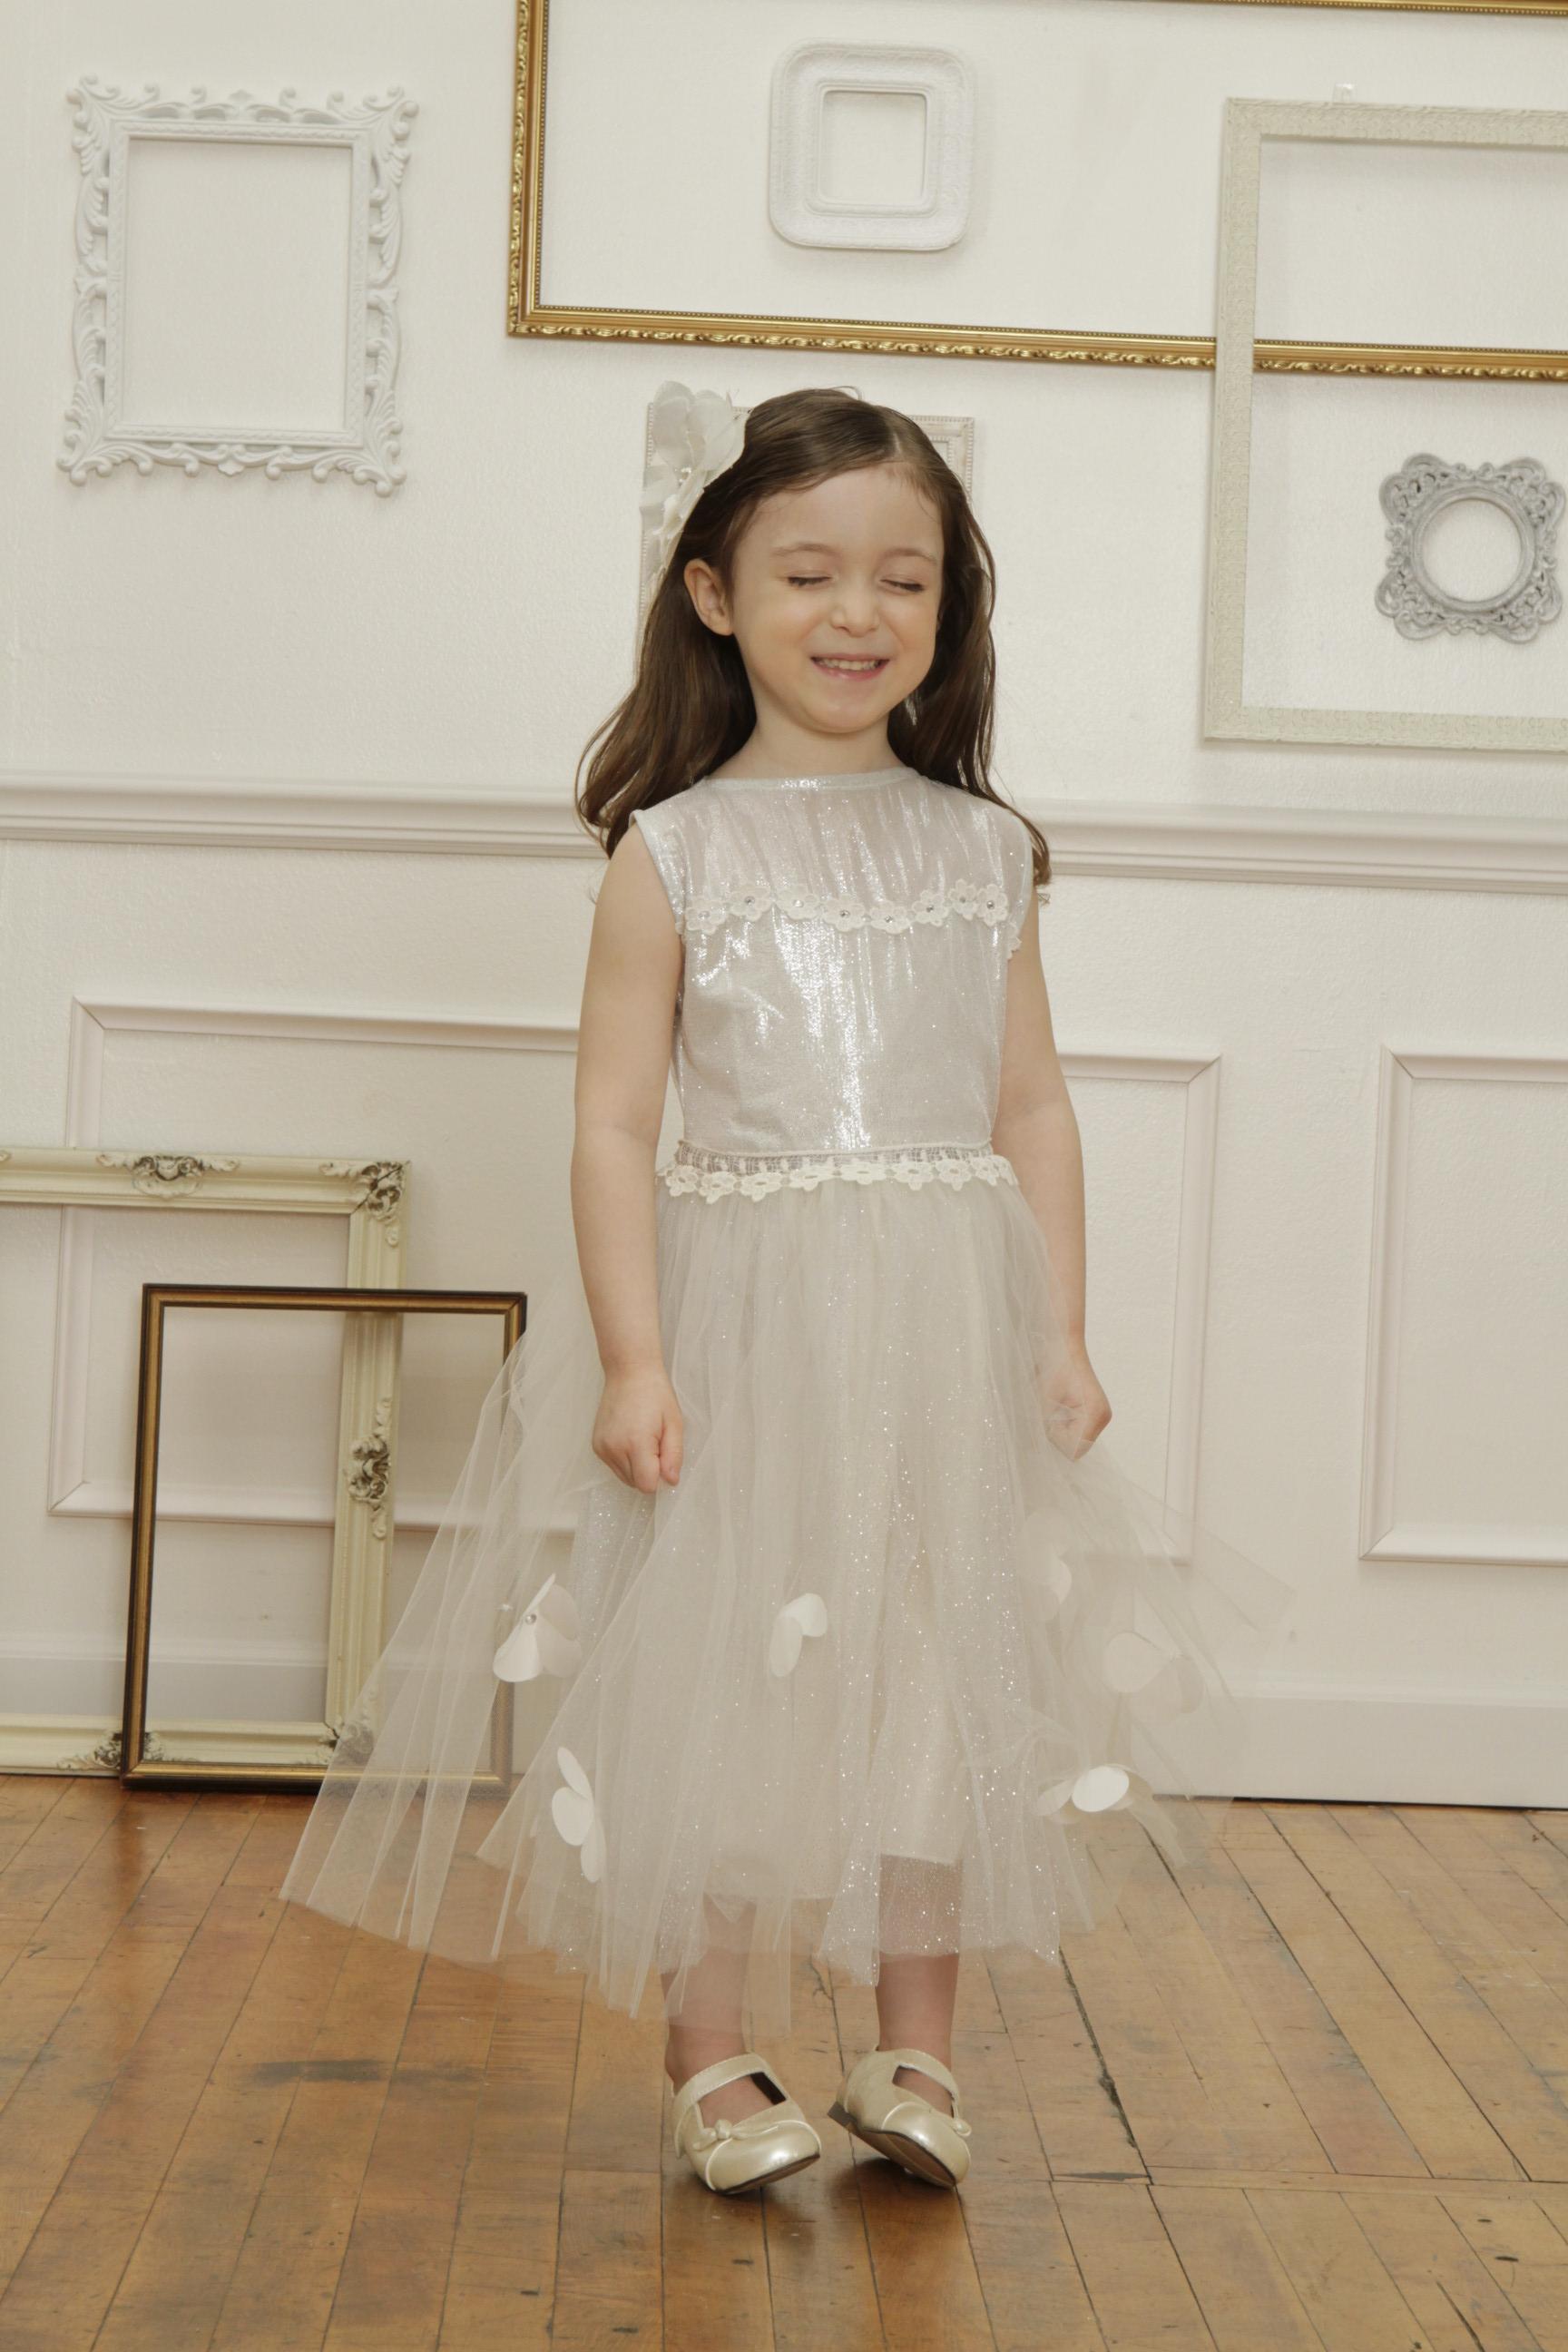 GAIA'S DRESS